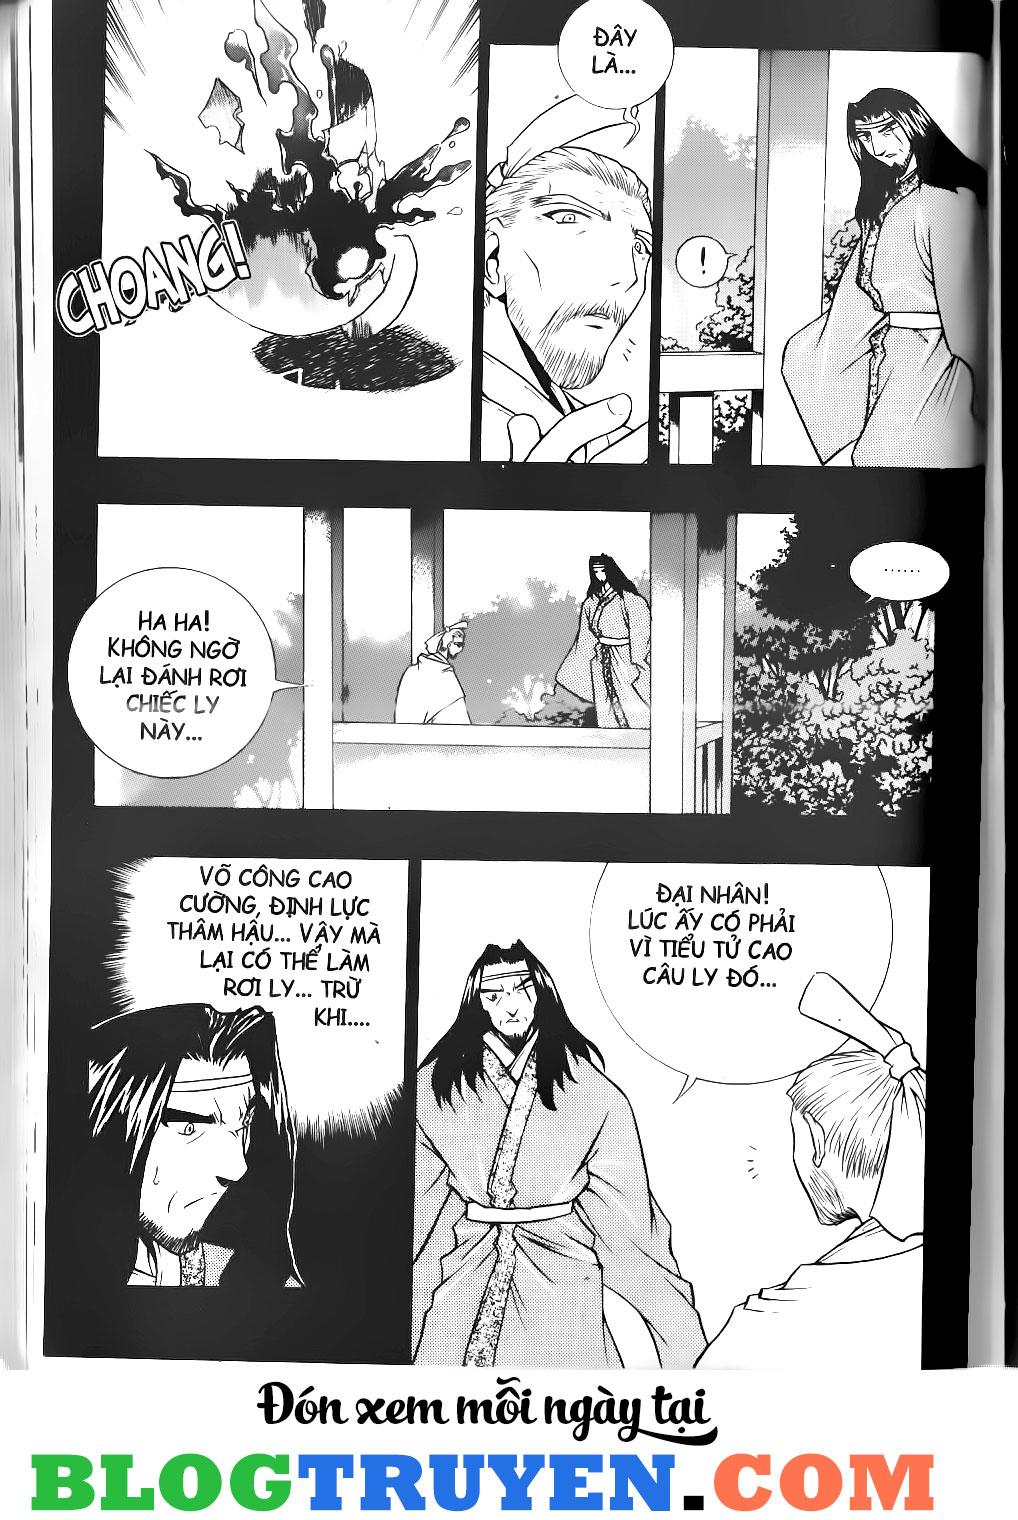 Thiên Lang Liệt Truyện Scan Chap 83 - Truyen.Chap.VN